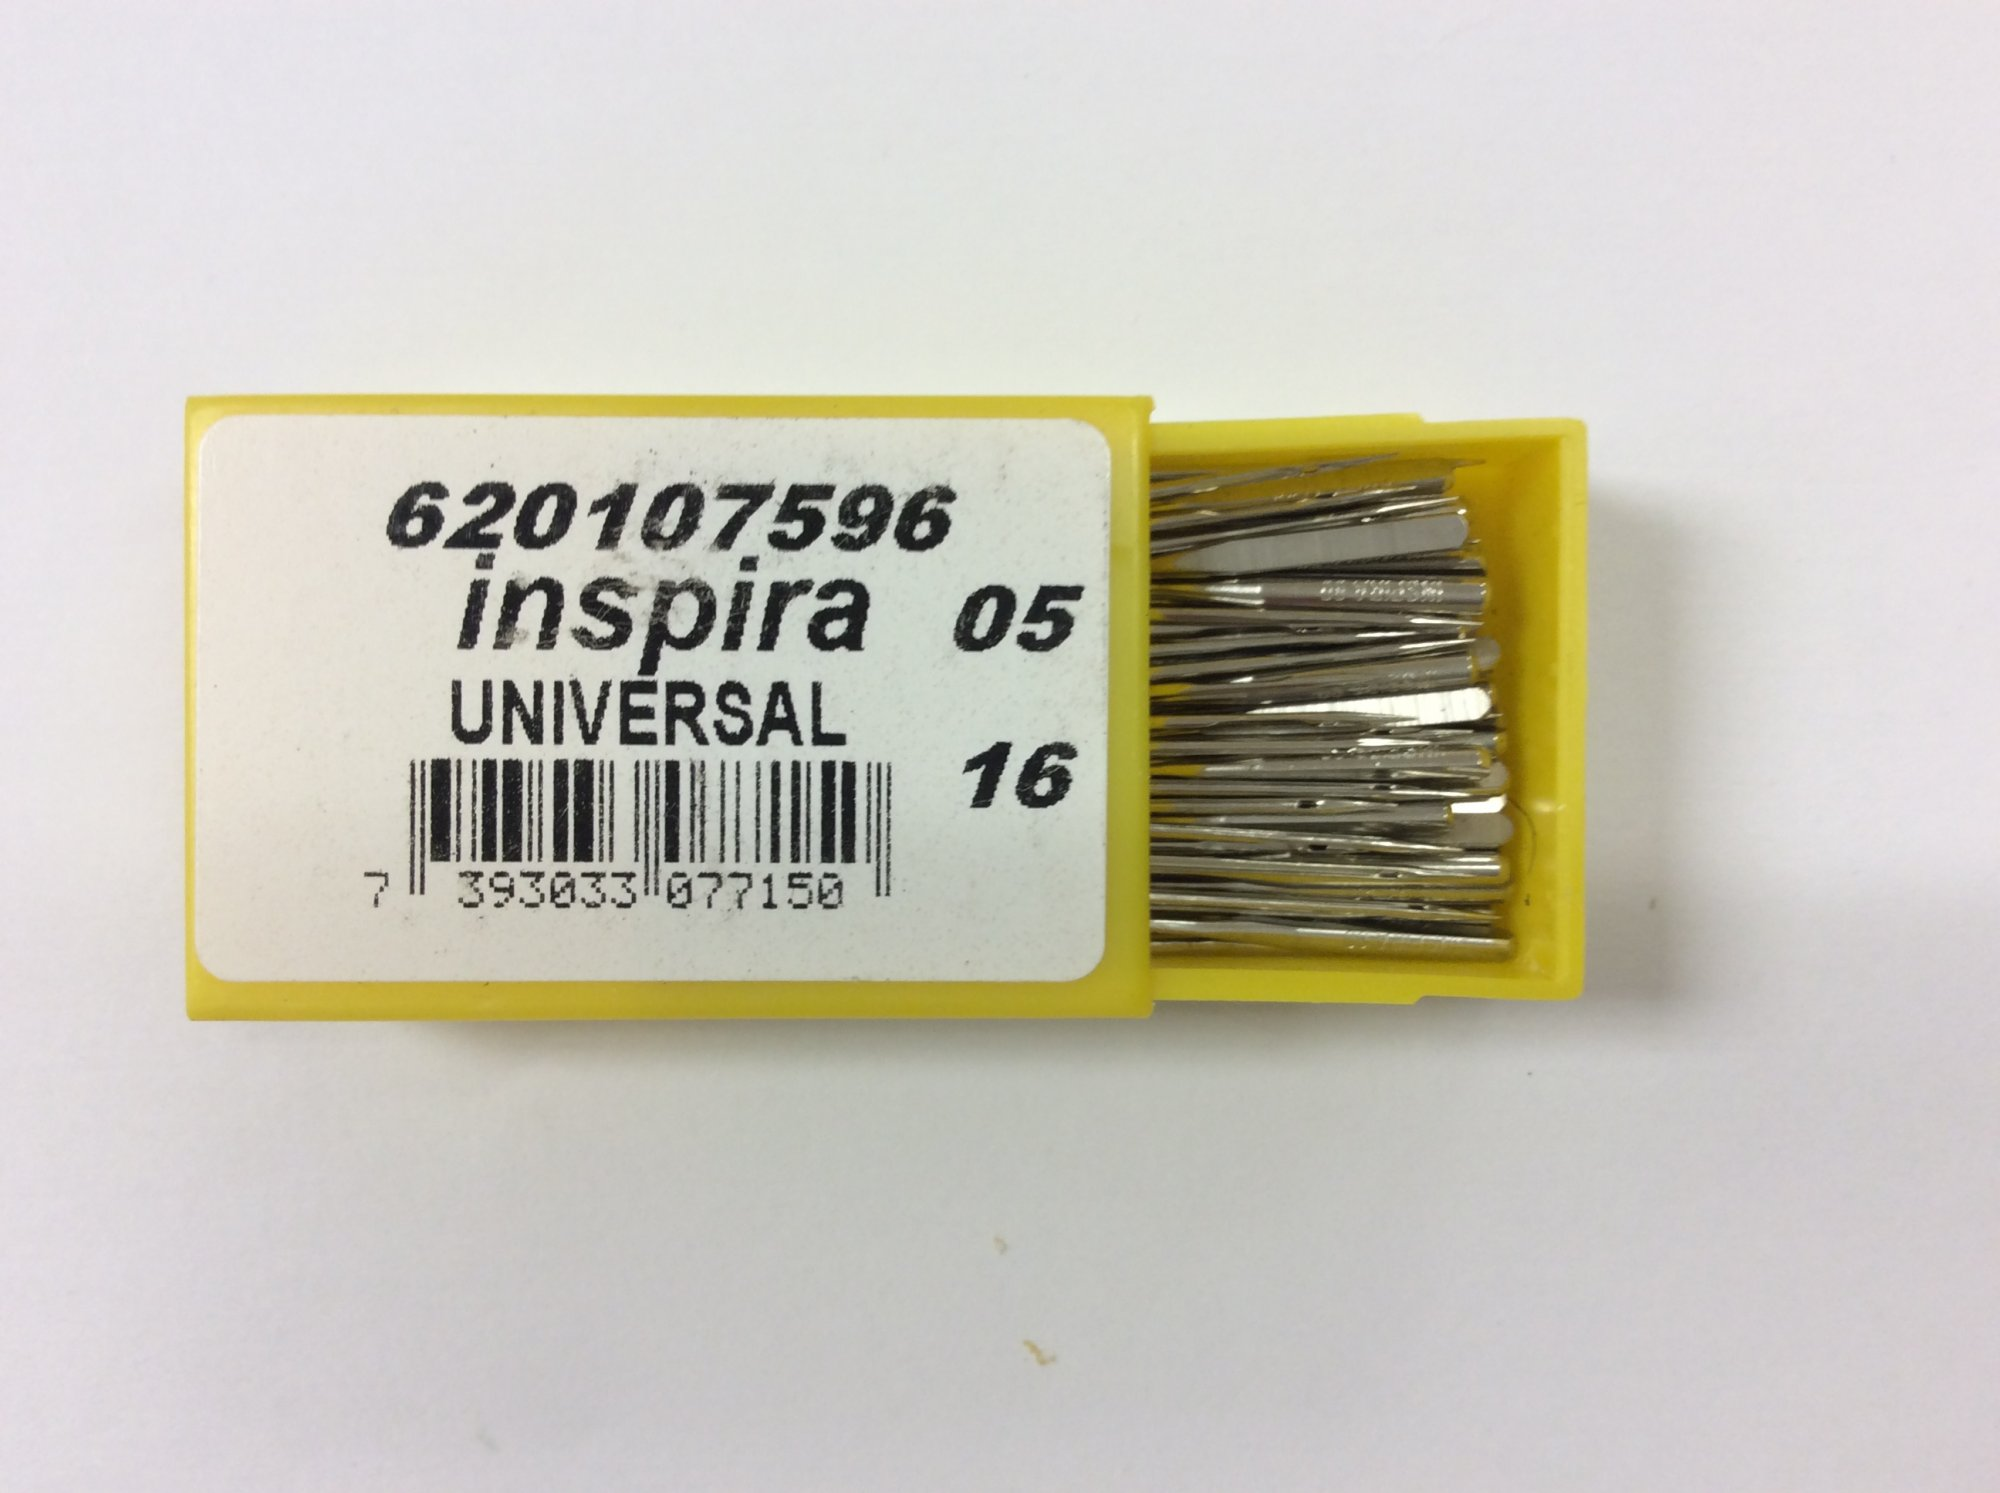 Overlock/Serger Needles (100 pack) Size 80/12 - Inspira